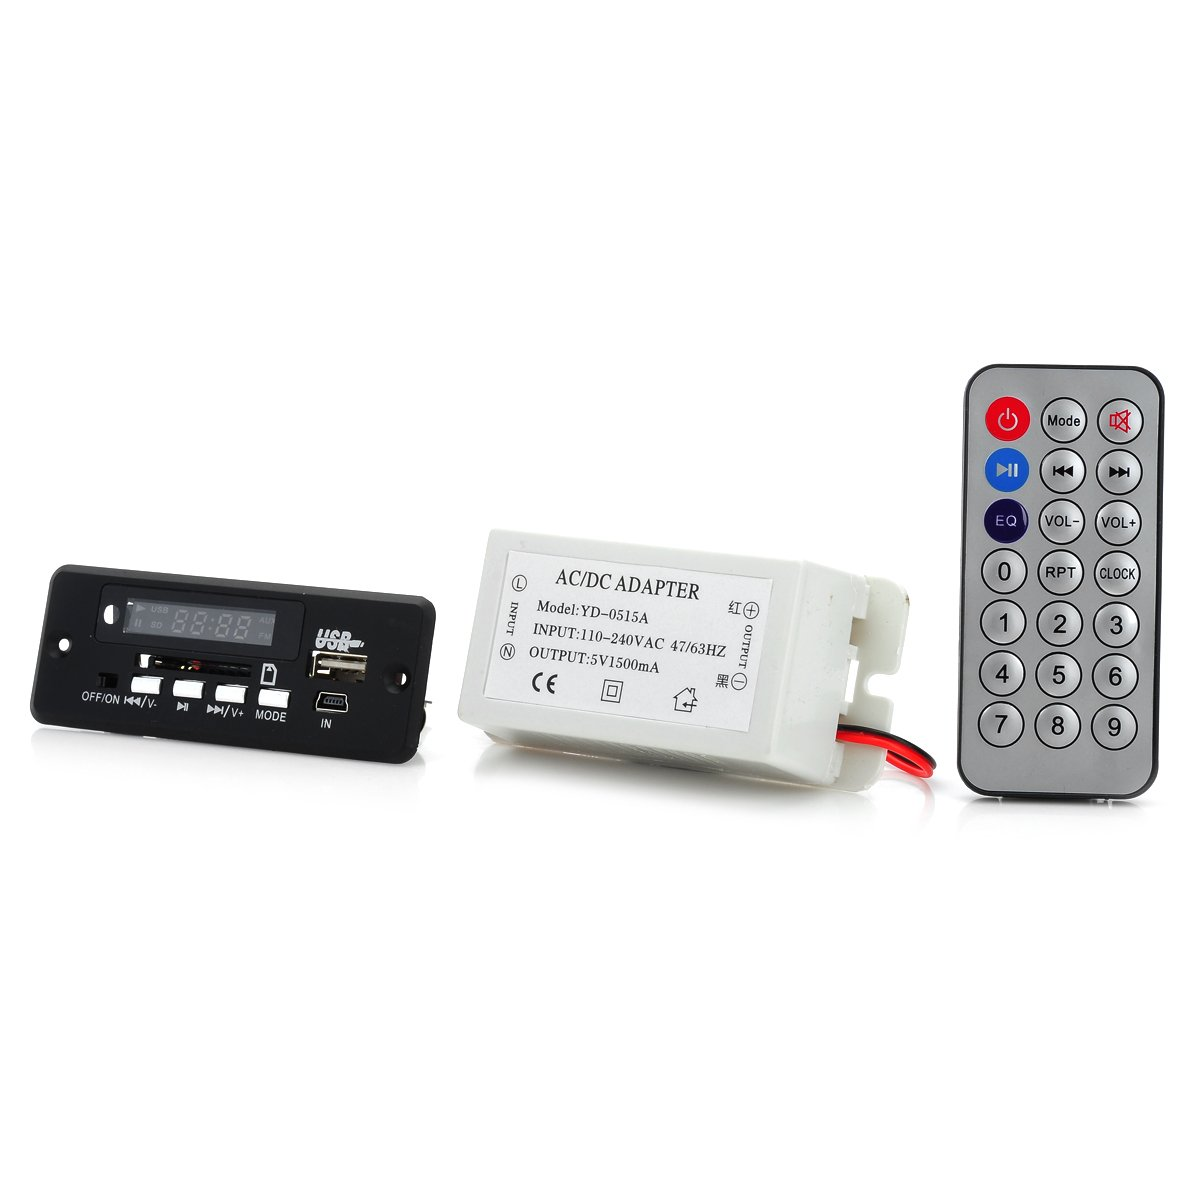 5 V mp3デコードBluetoothアンプボードW /リモートコントロール+ AC / DCアダプタ – ブラック+ホワイト B078Z6HQJC